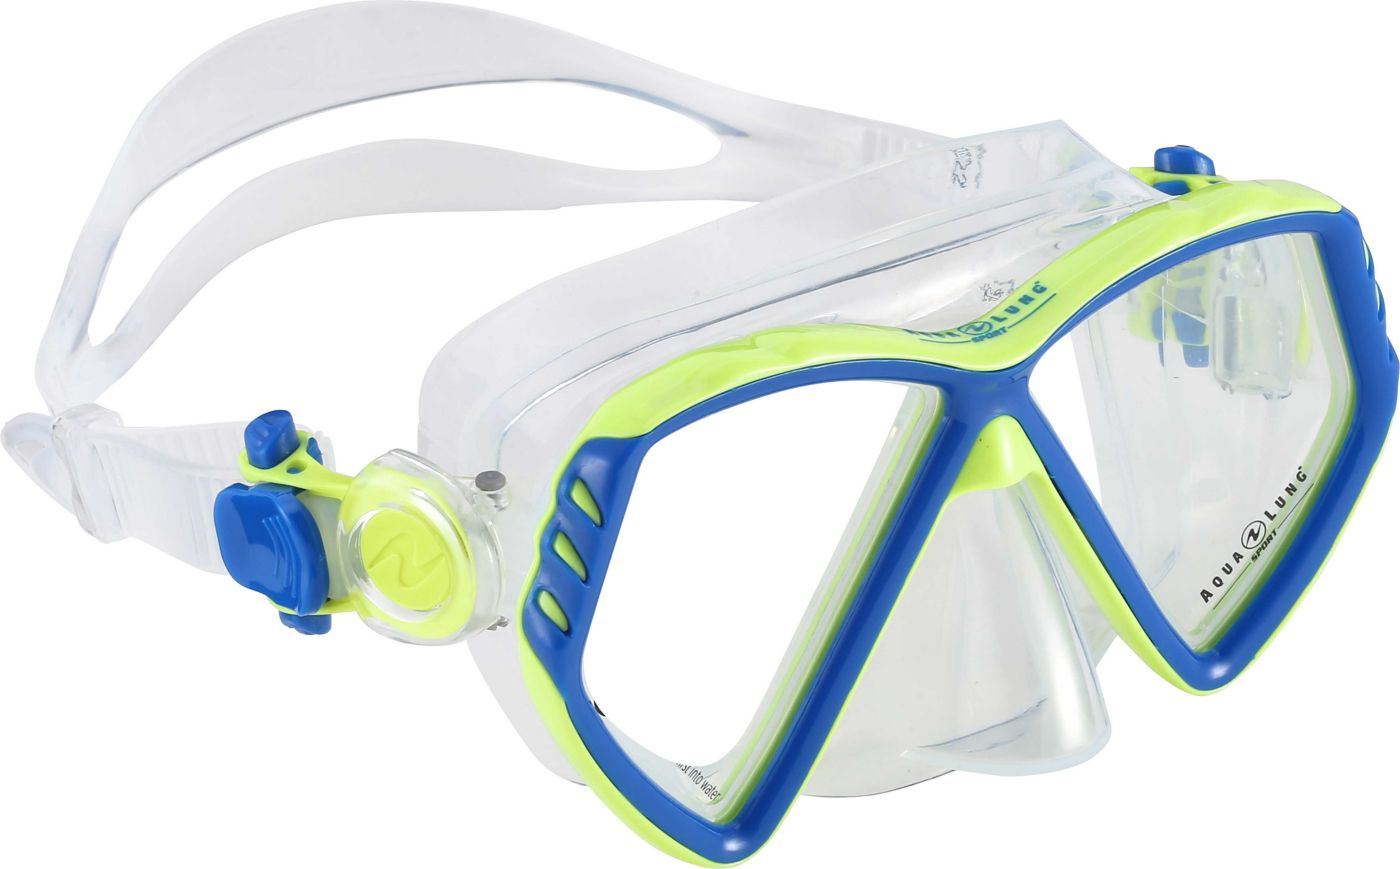 Aqua Lung Sport Youth Cub Snorkeling Mask